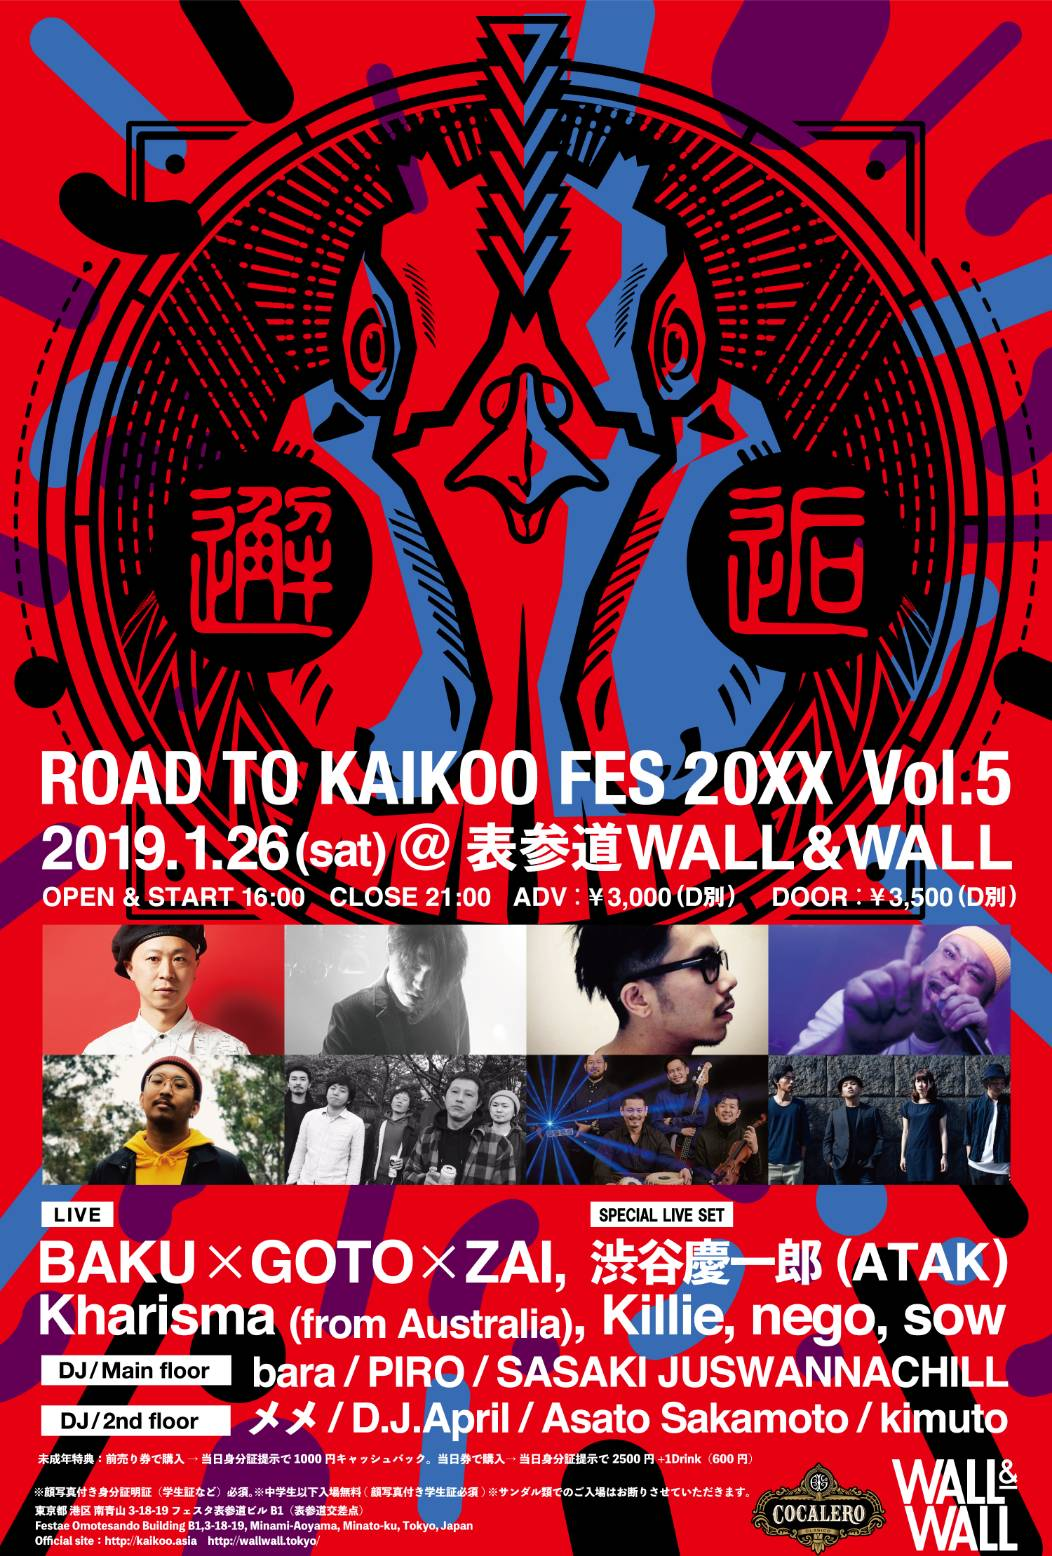 ROAD TO KAIKOO FES 20XX Vol.5